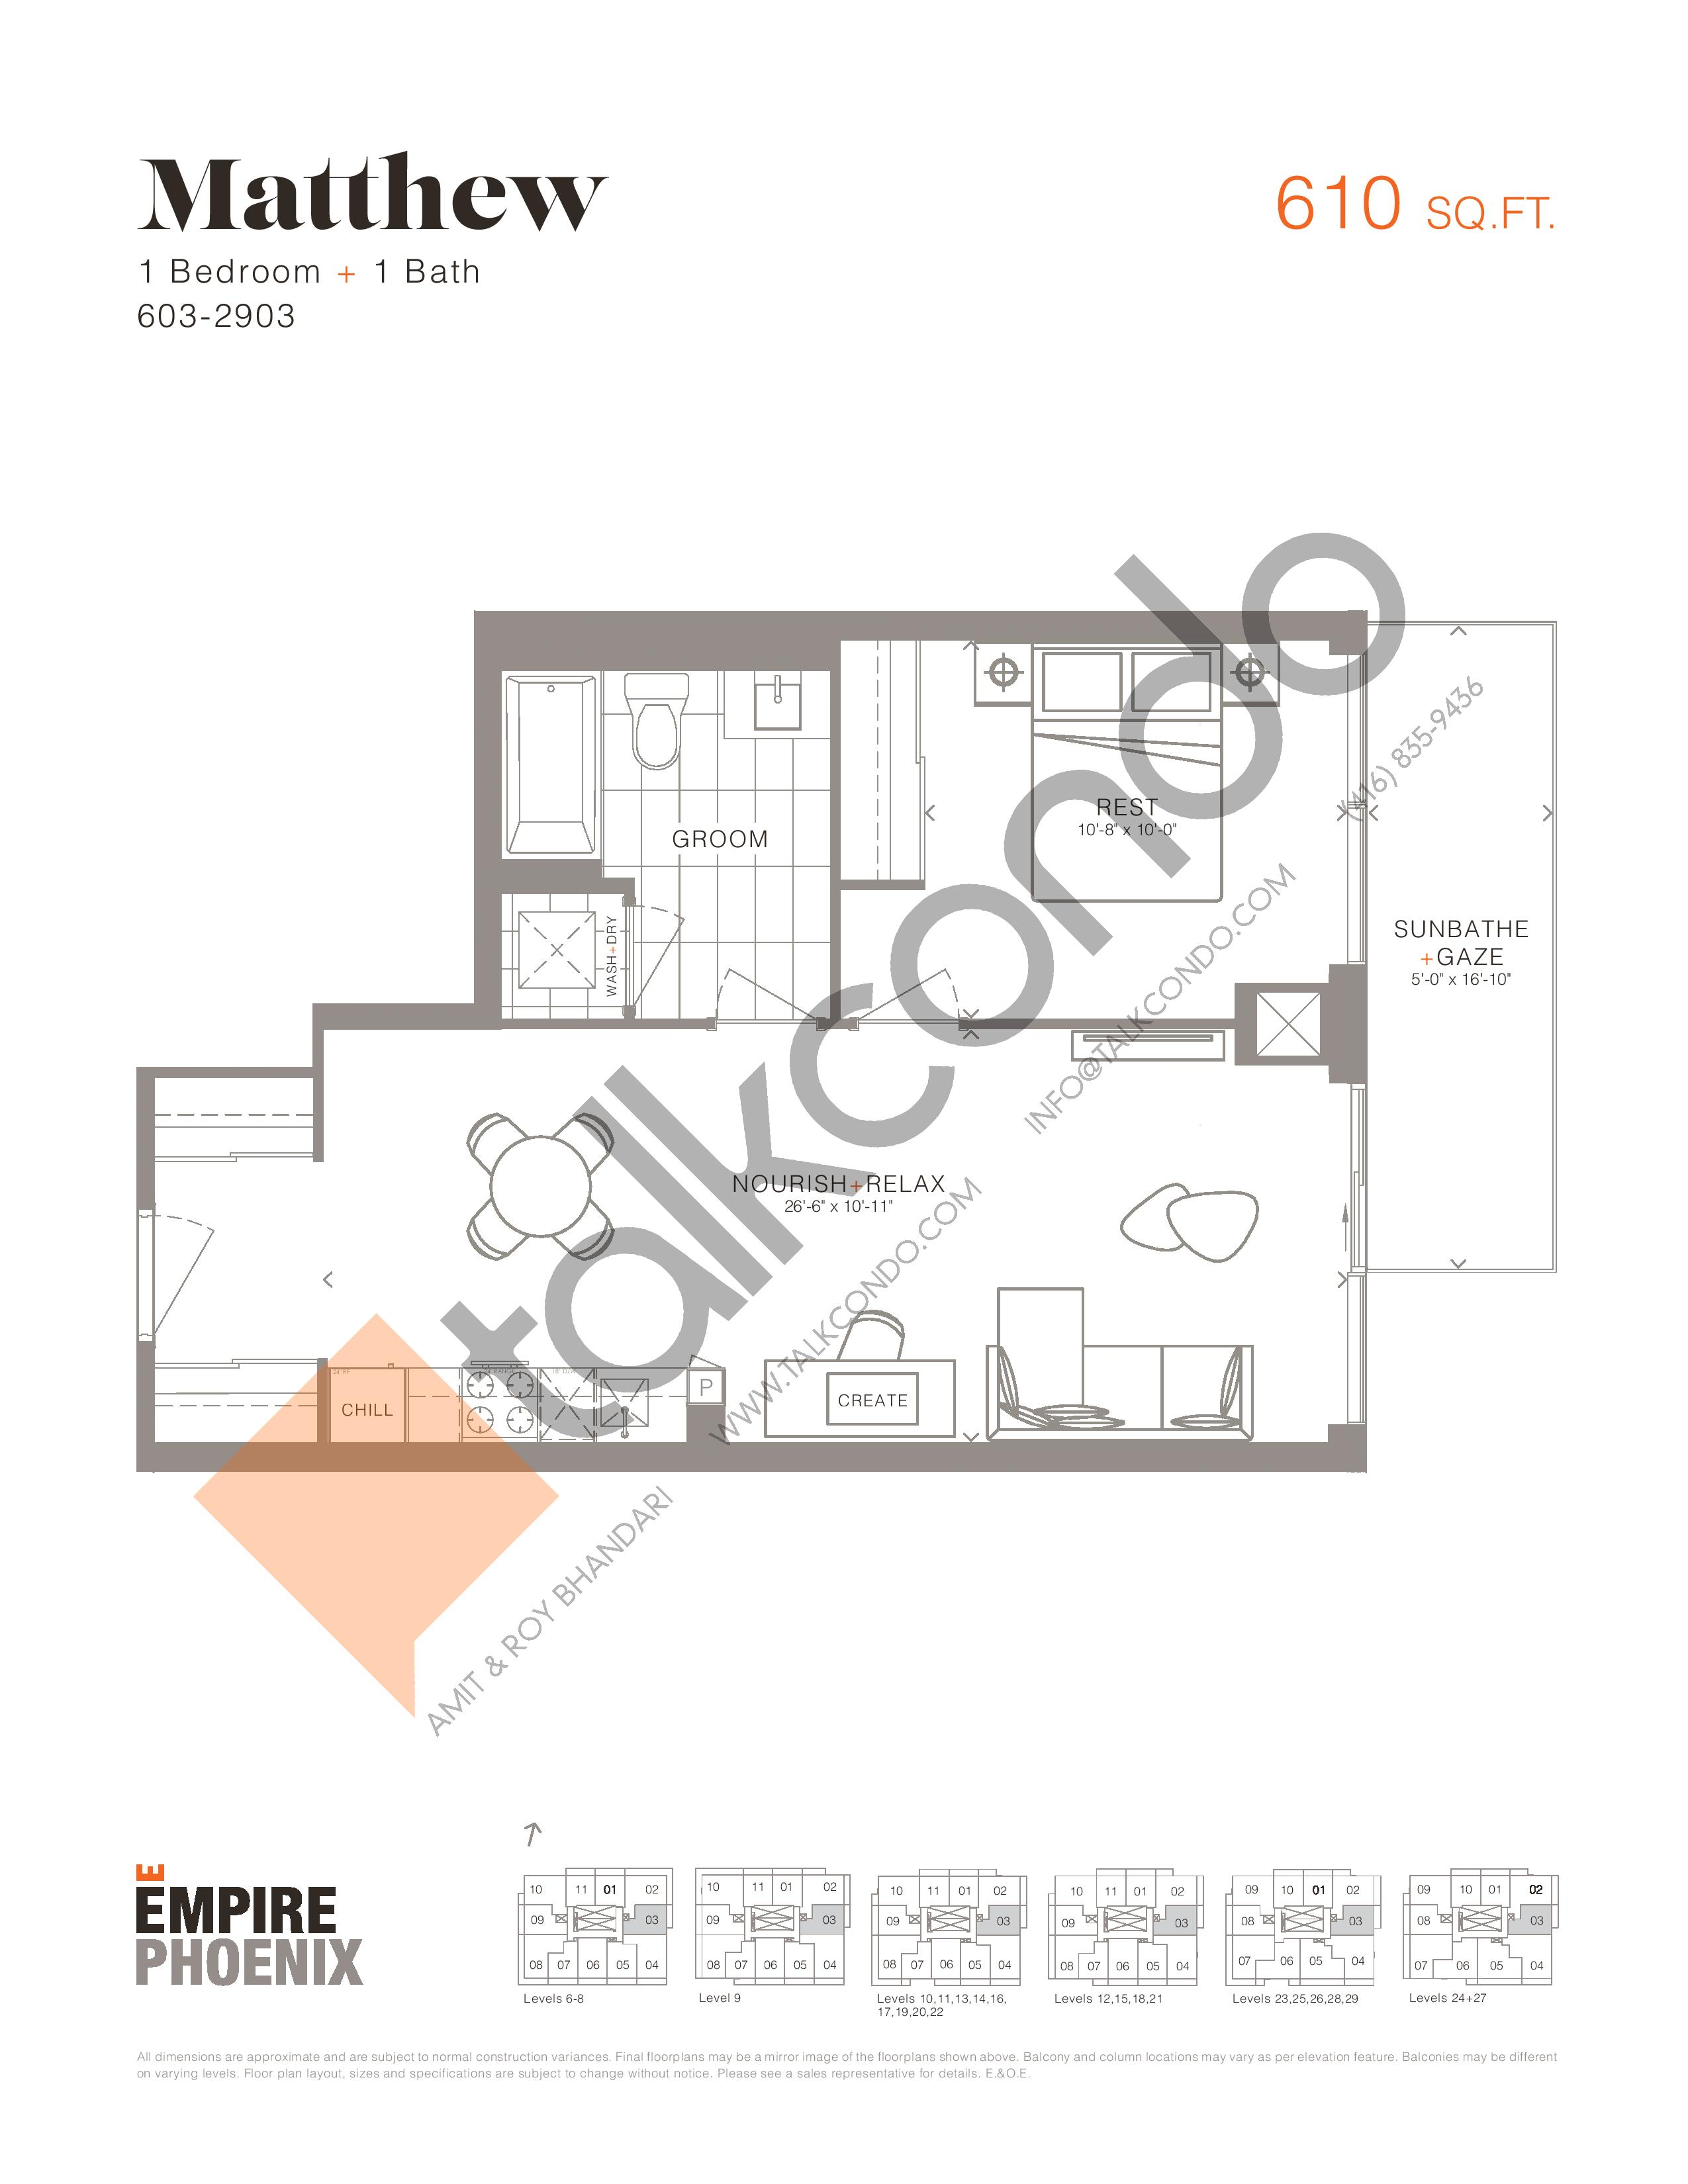 Matthew Floor Plan at Empire Phoenix Phase 2 Condos - 610 sq.ft